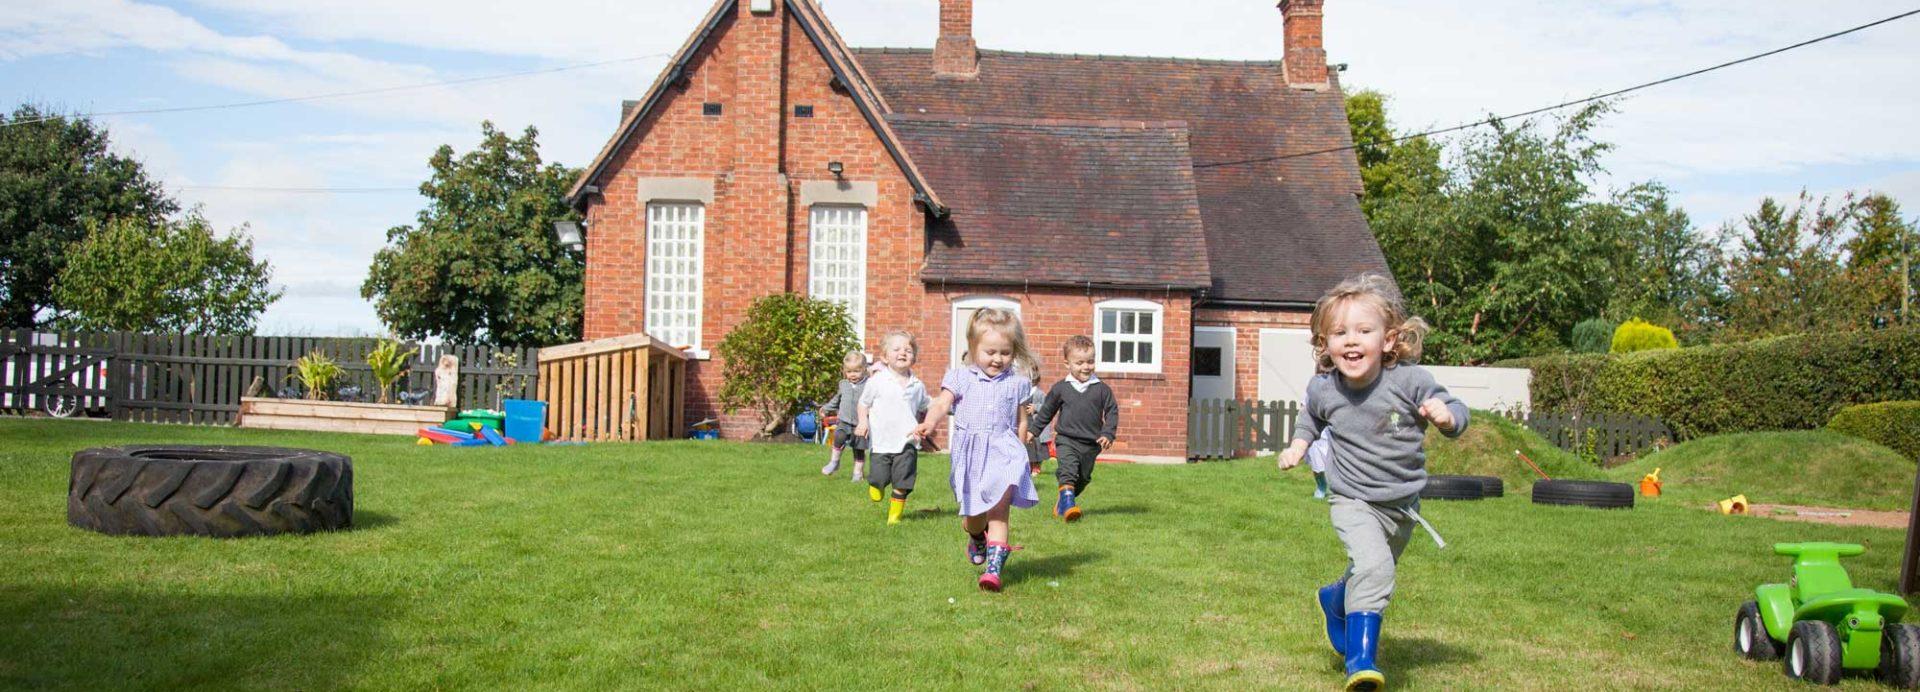 Stretton Lodge Nursery